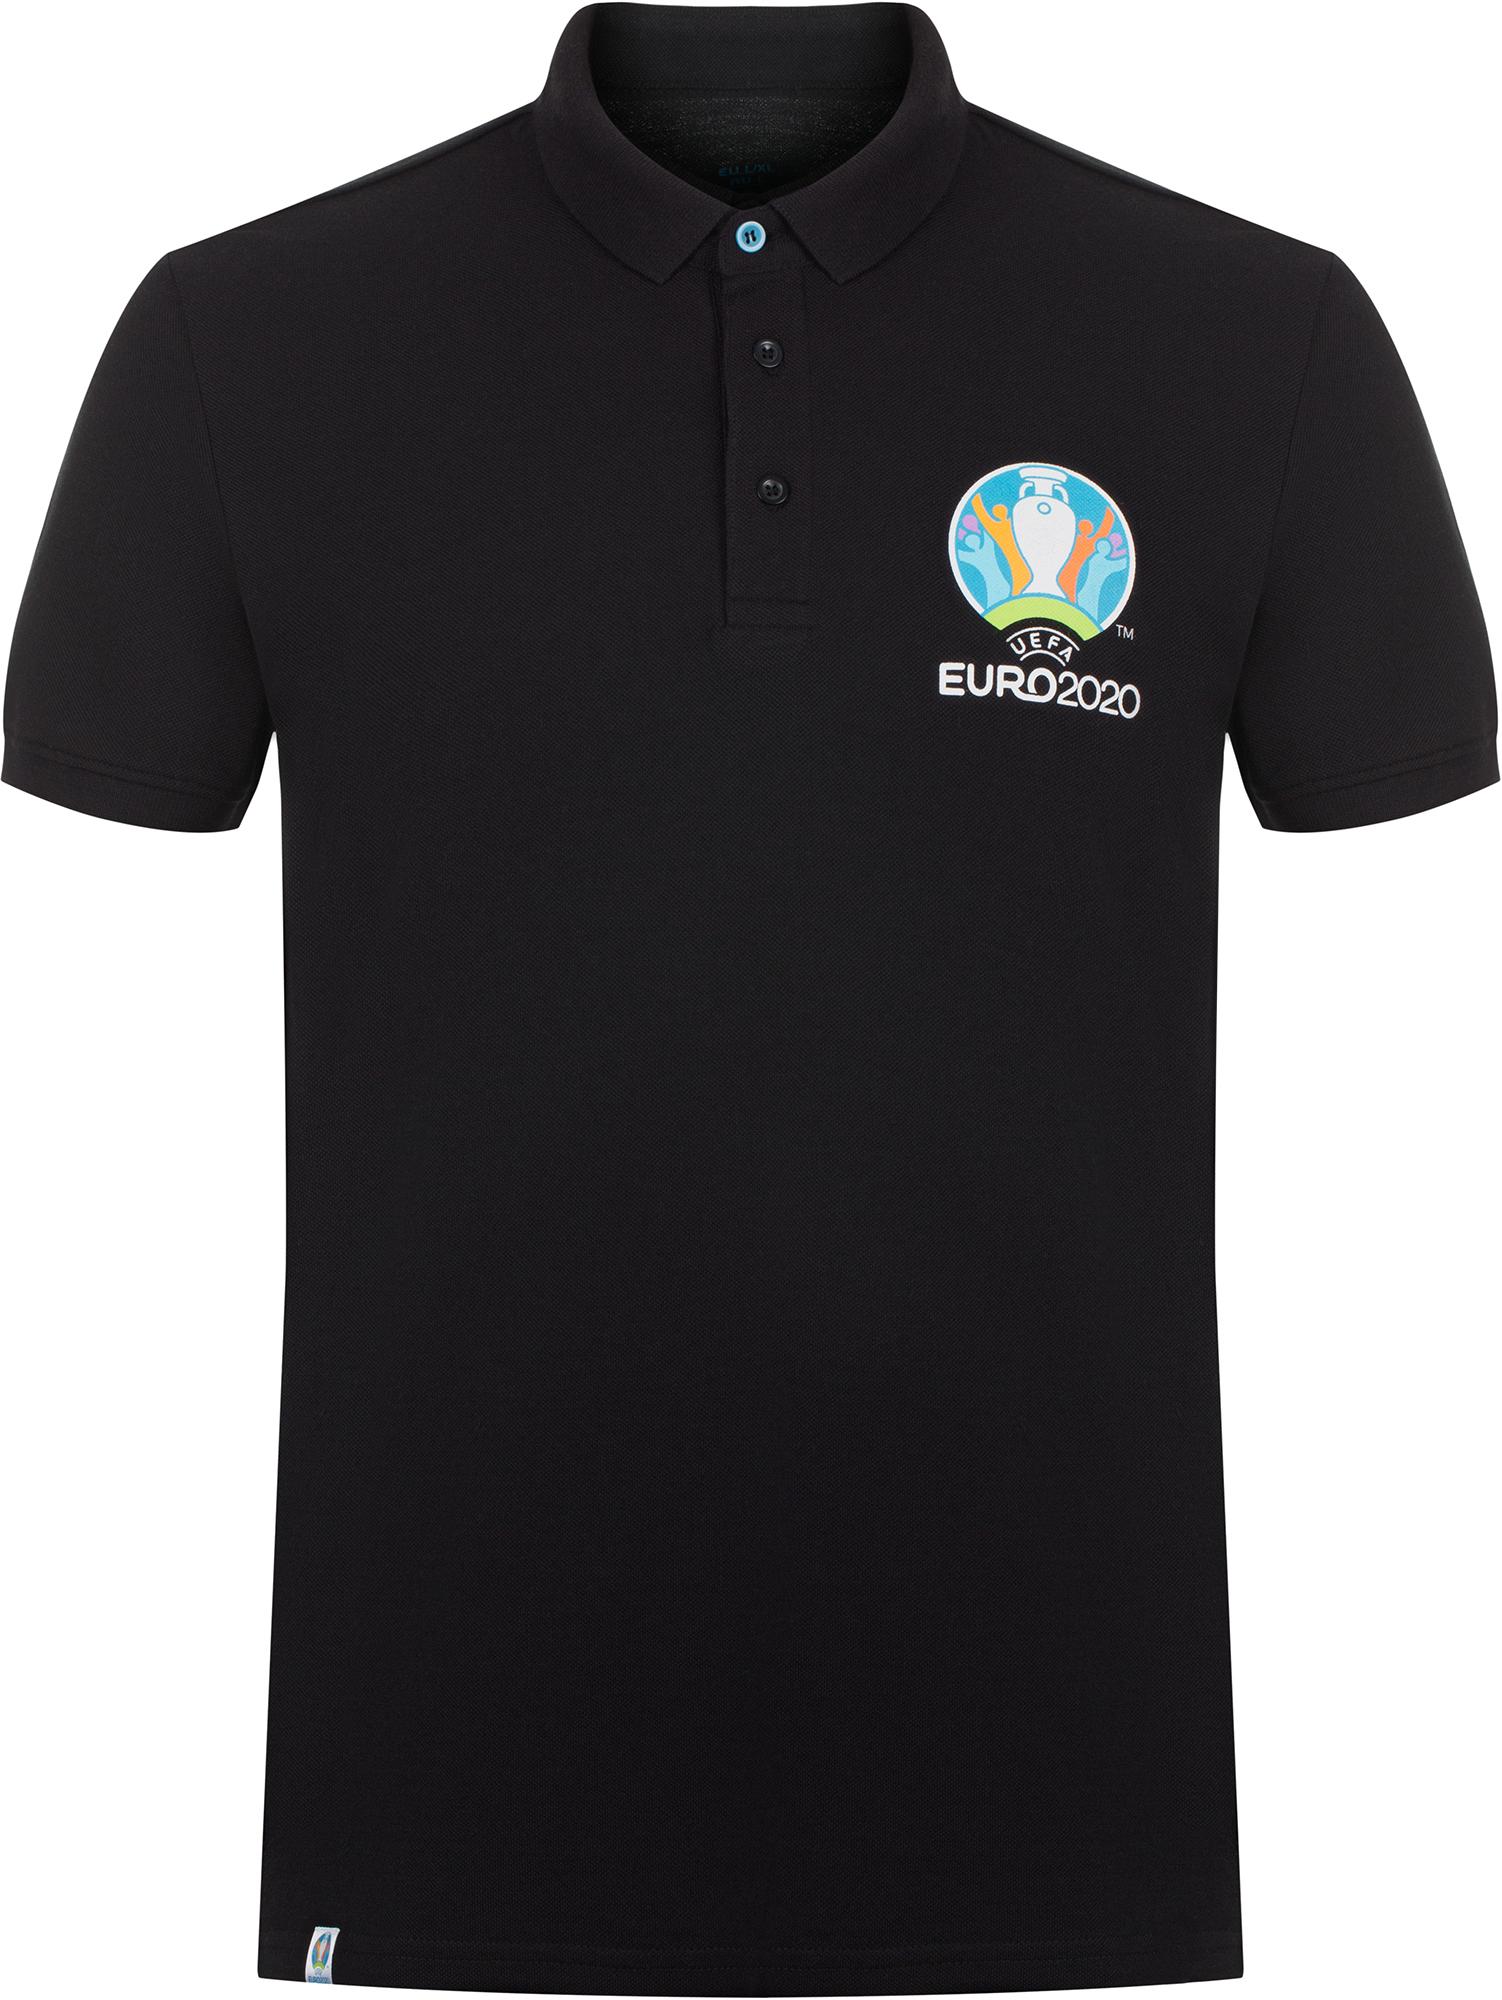 UEFA EURO 2020 Поло мужское UEFA EURO 2020, размер 54 подушка printio uefa euro 2016